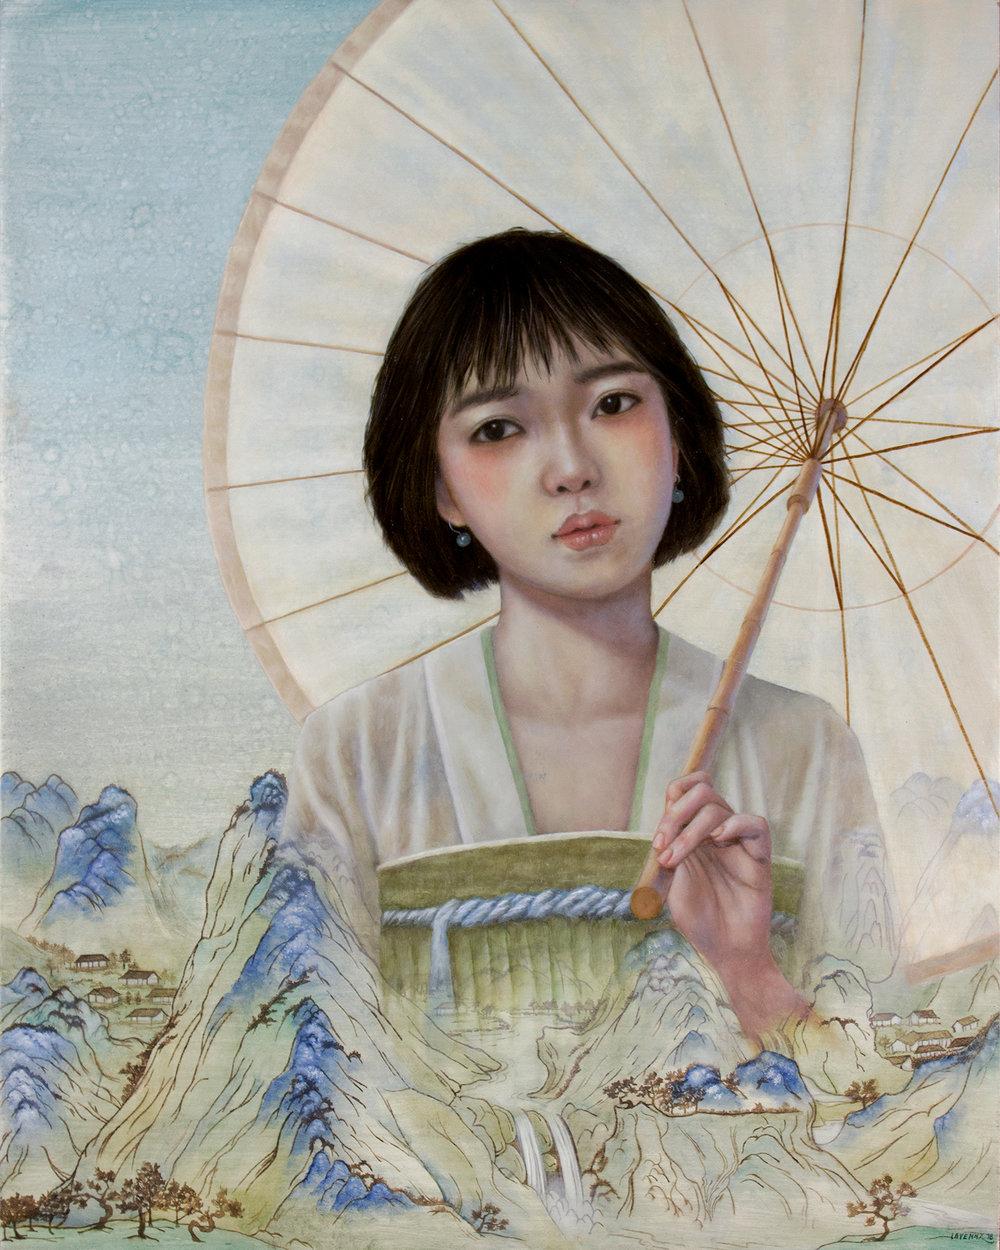 叙旧 (Xujiu, talking about old times), 2018